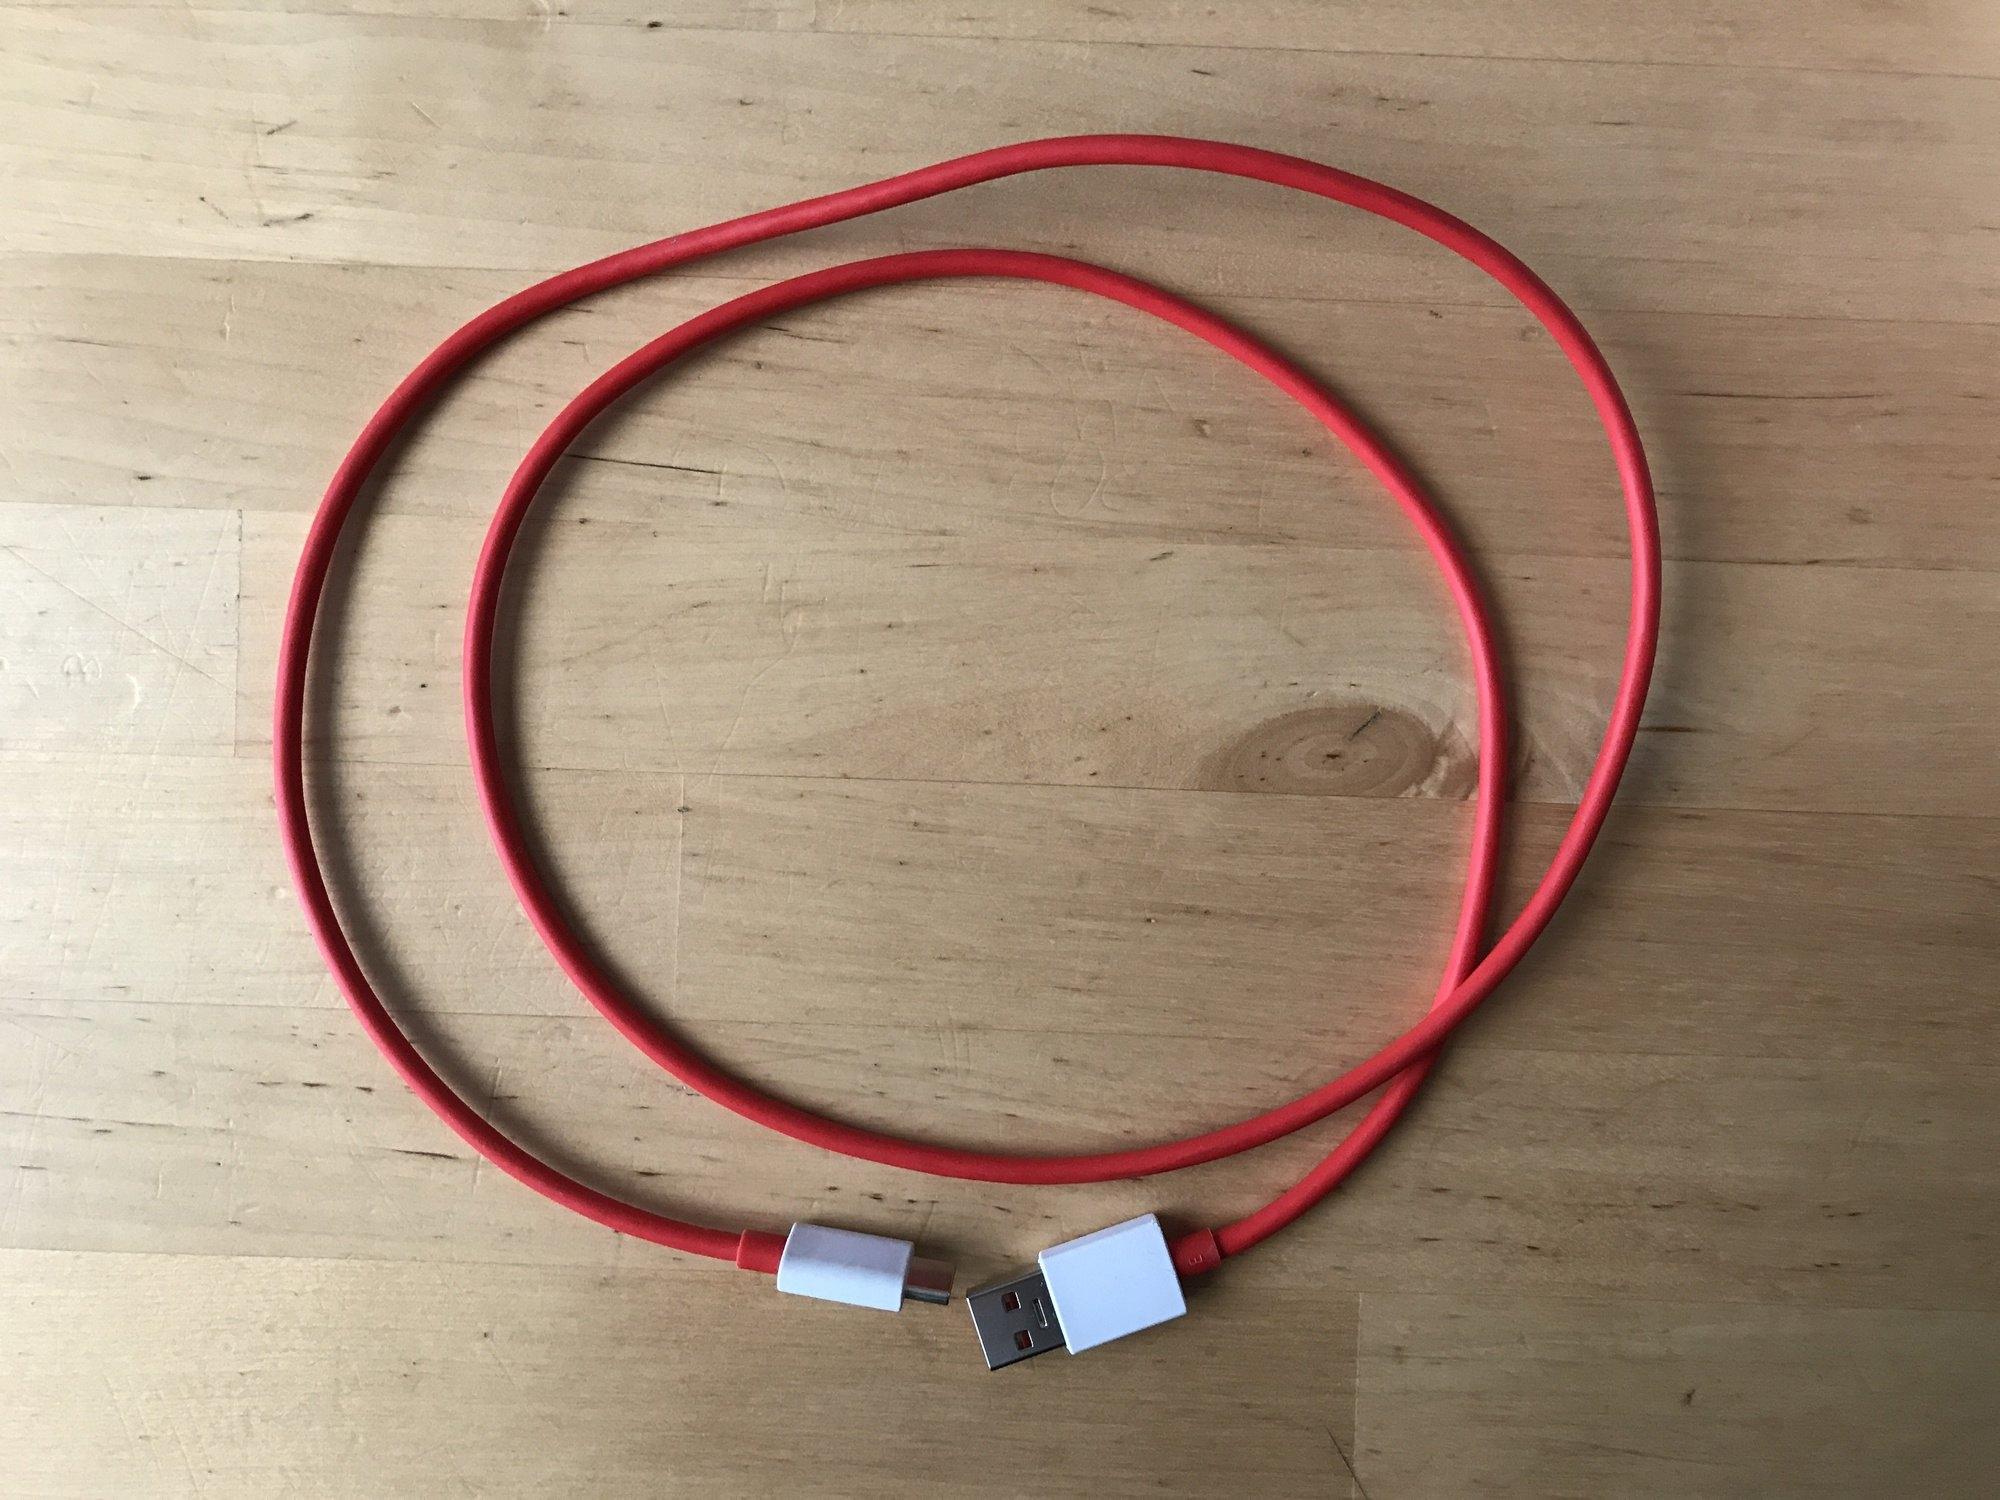 Câble du Oneplus 7 Pro